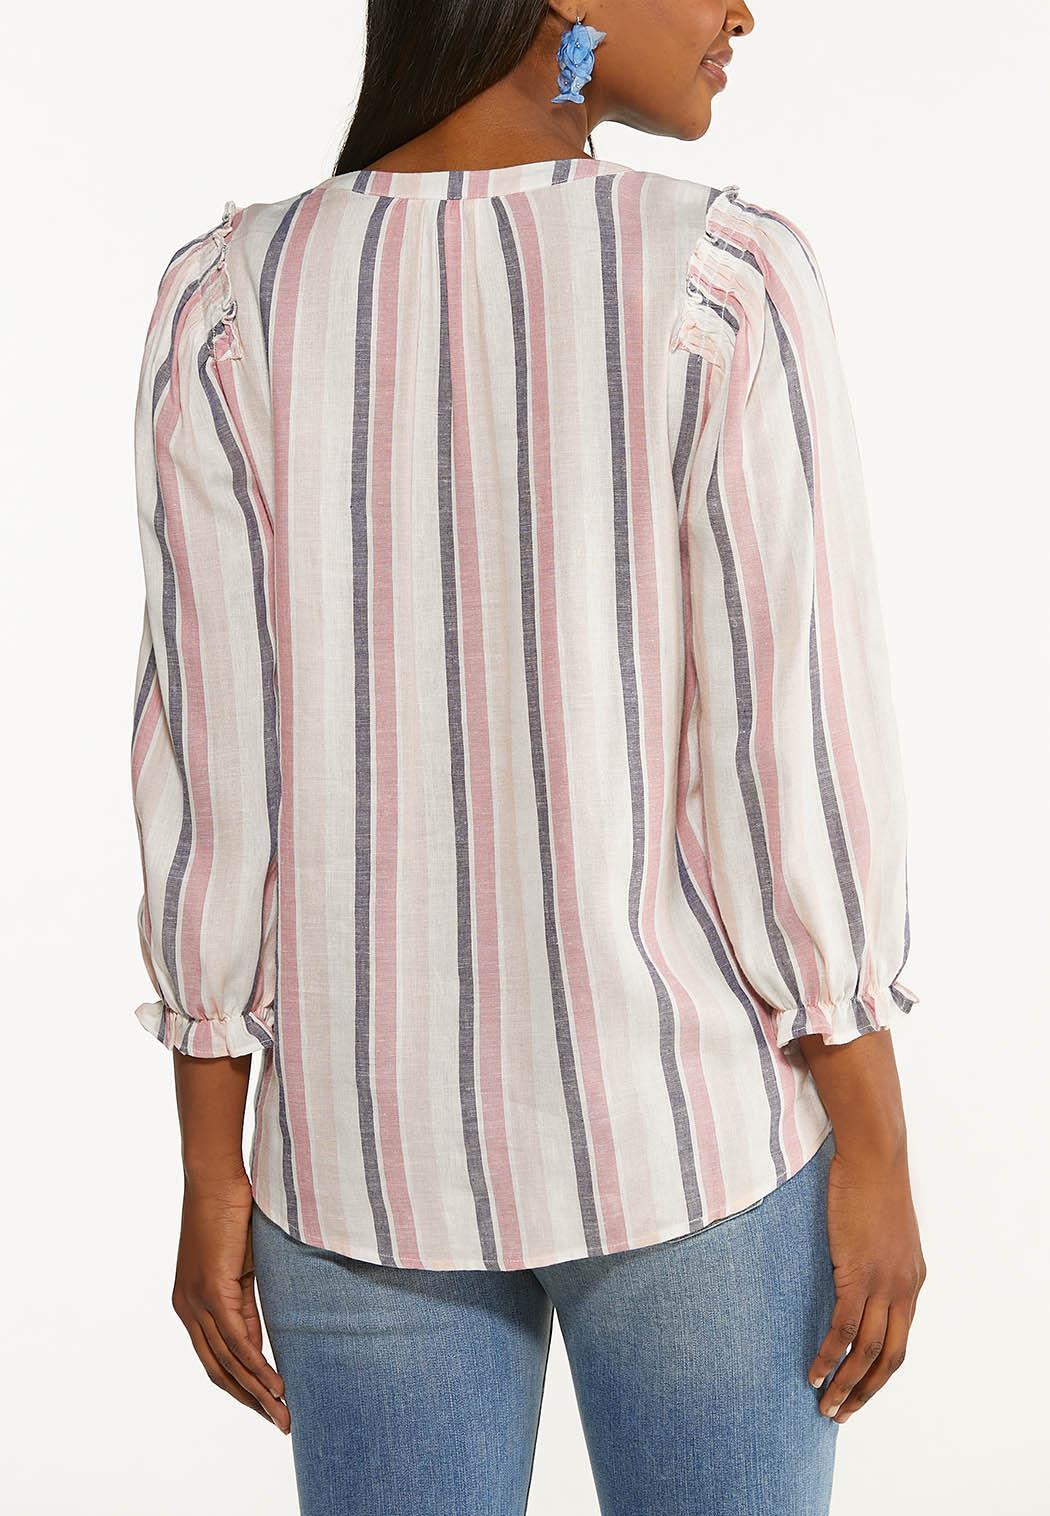 Berry Stripe Top (Item #44488346)